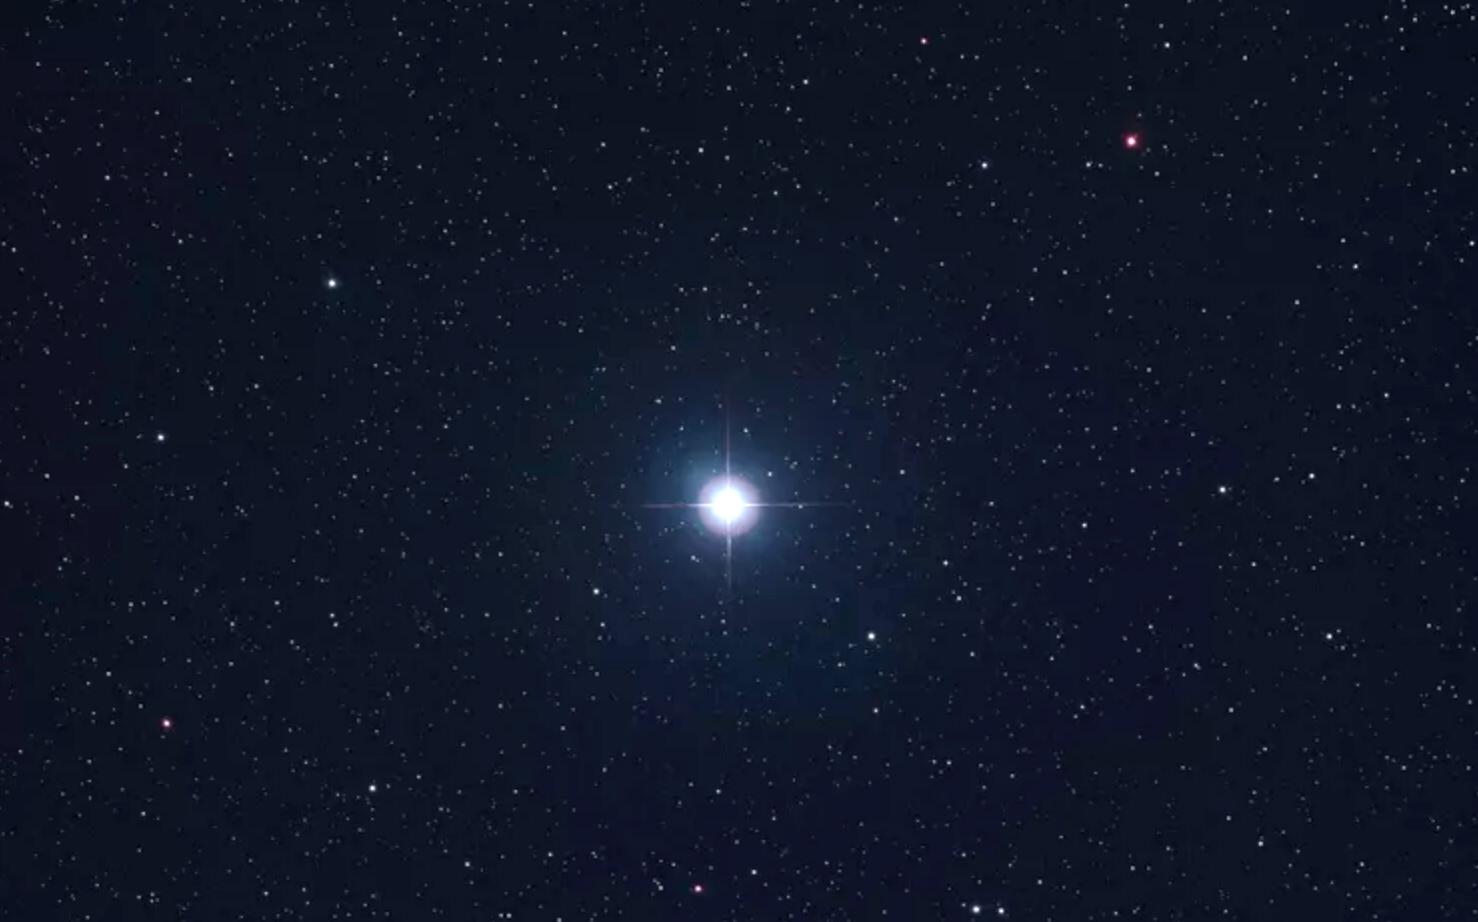 Human Journey Between Sirius and Vega